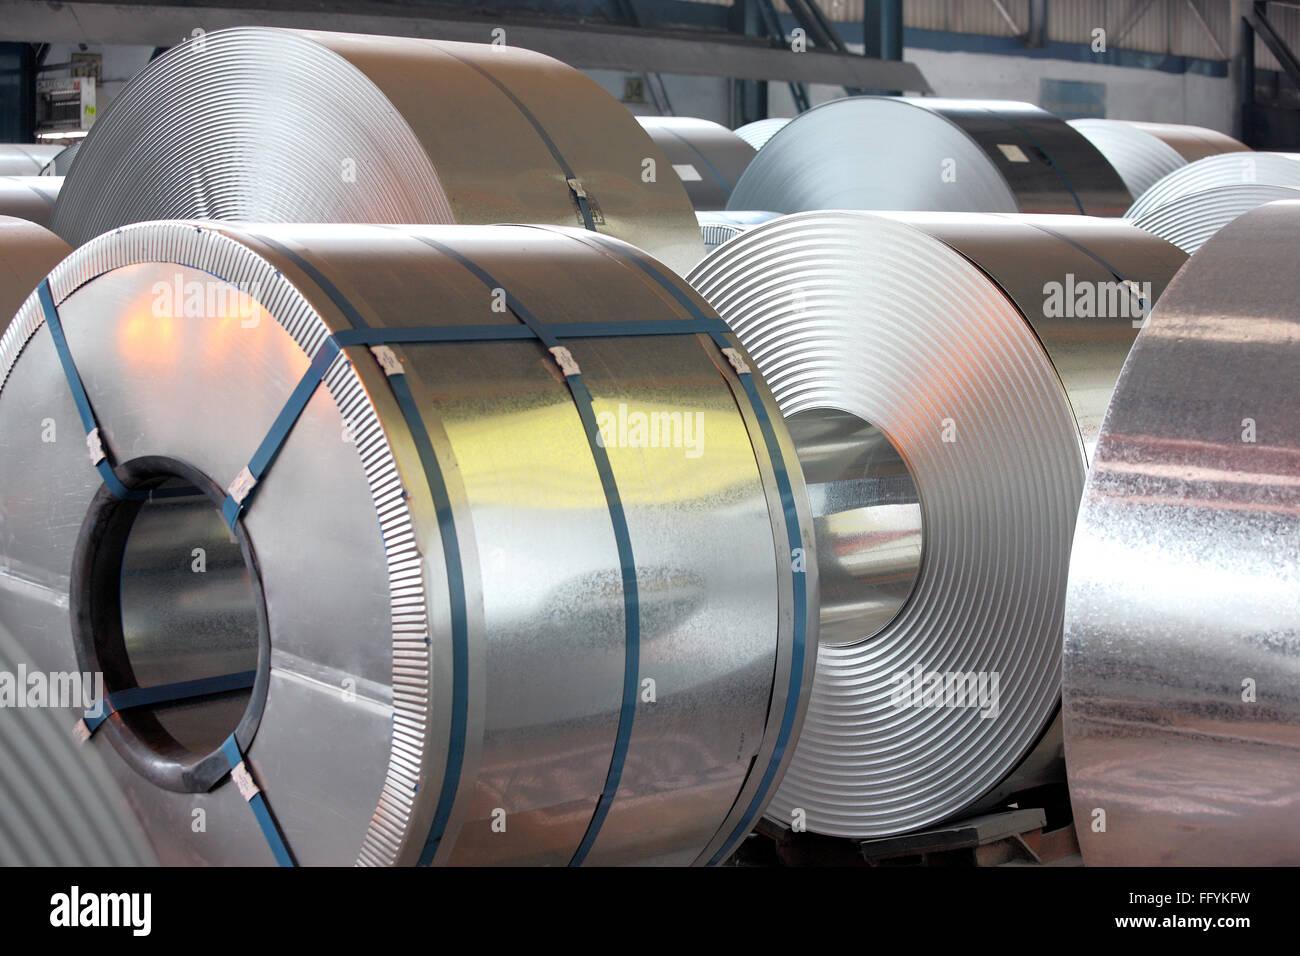 Galvanised Steel Sheet India - Stock Image